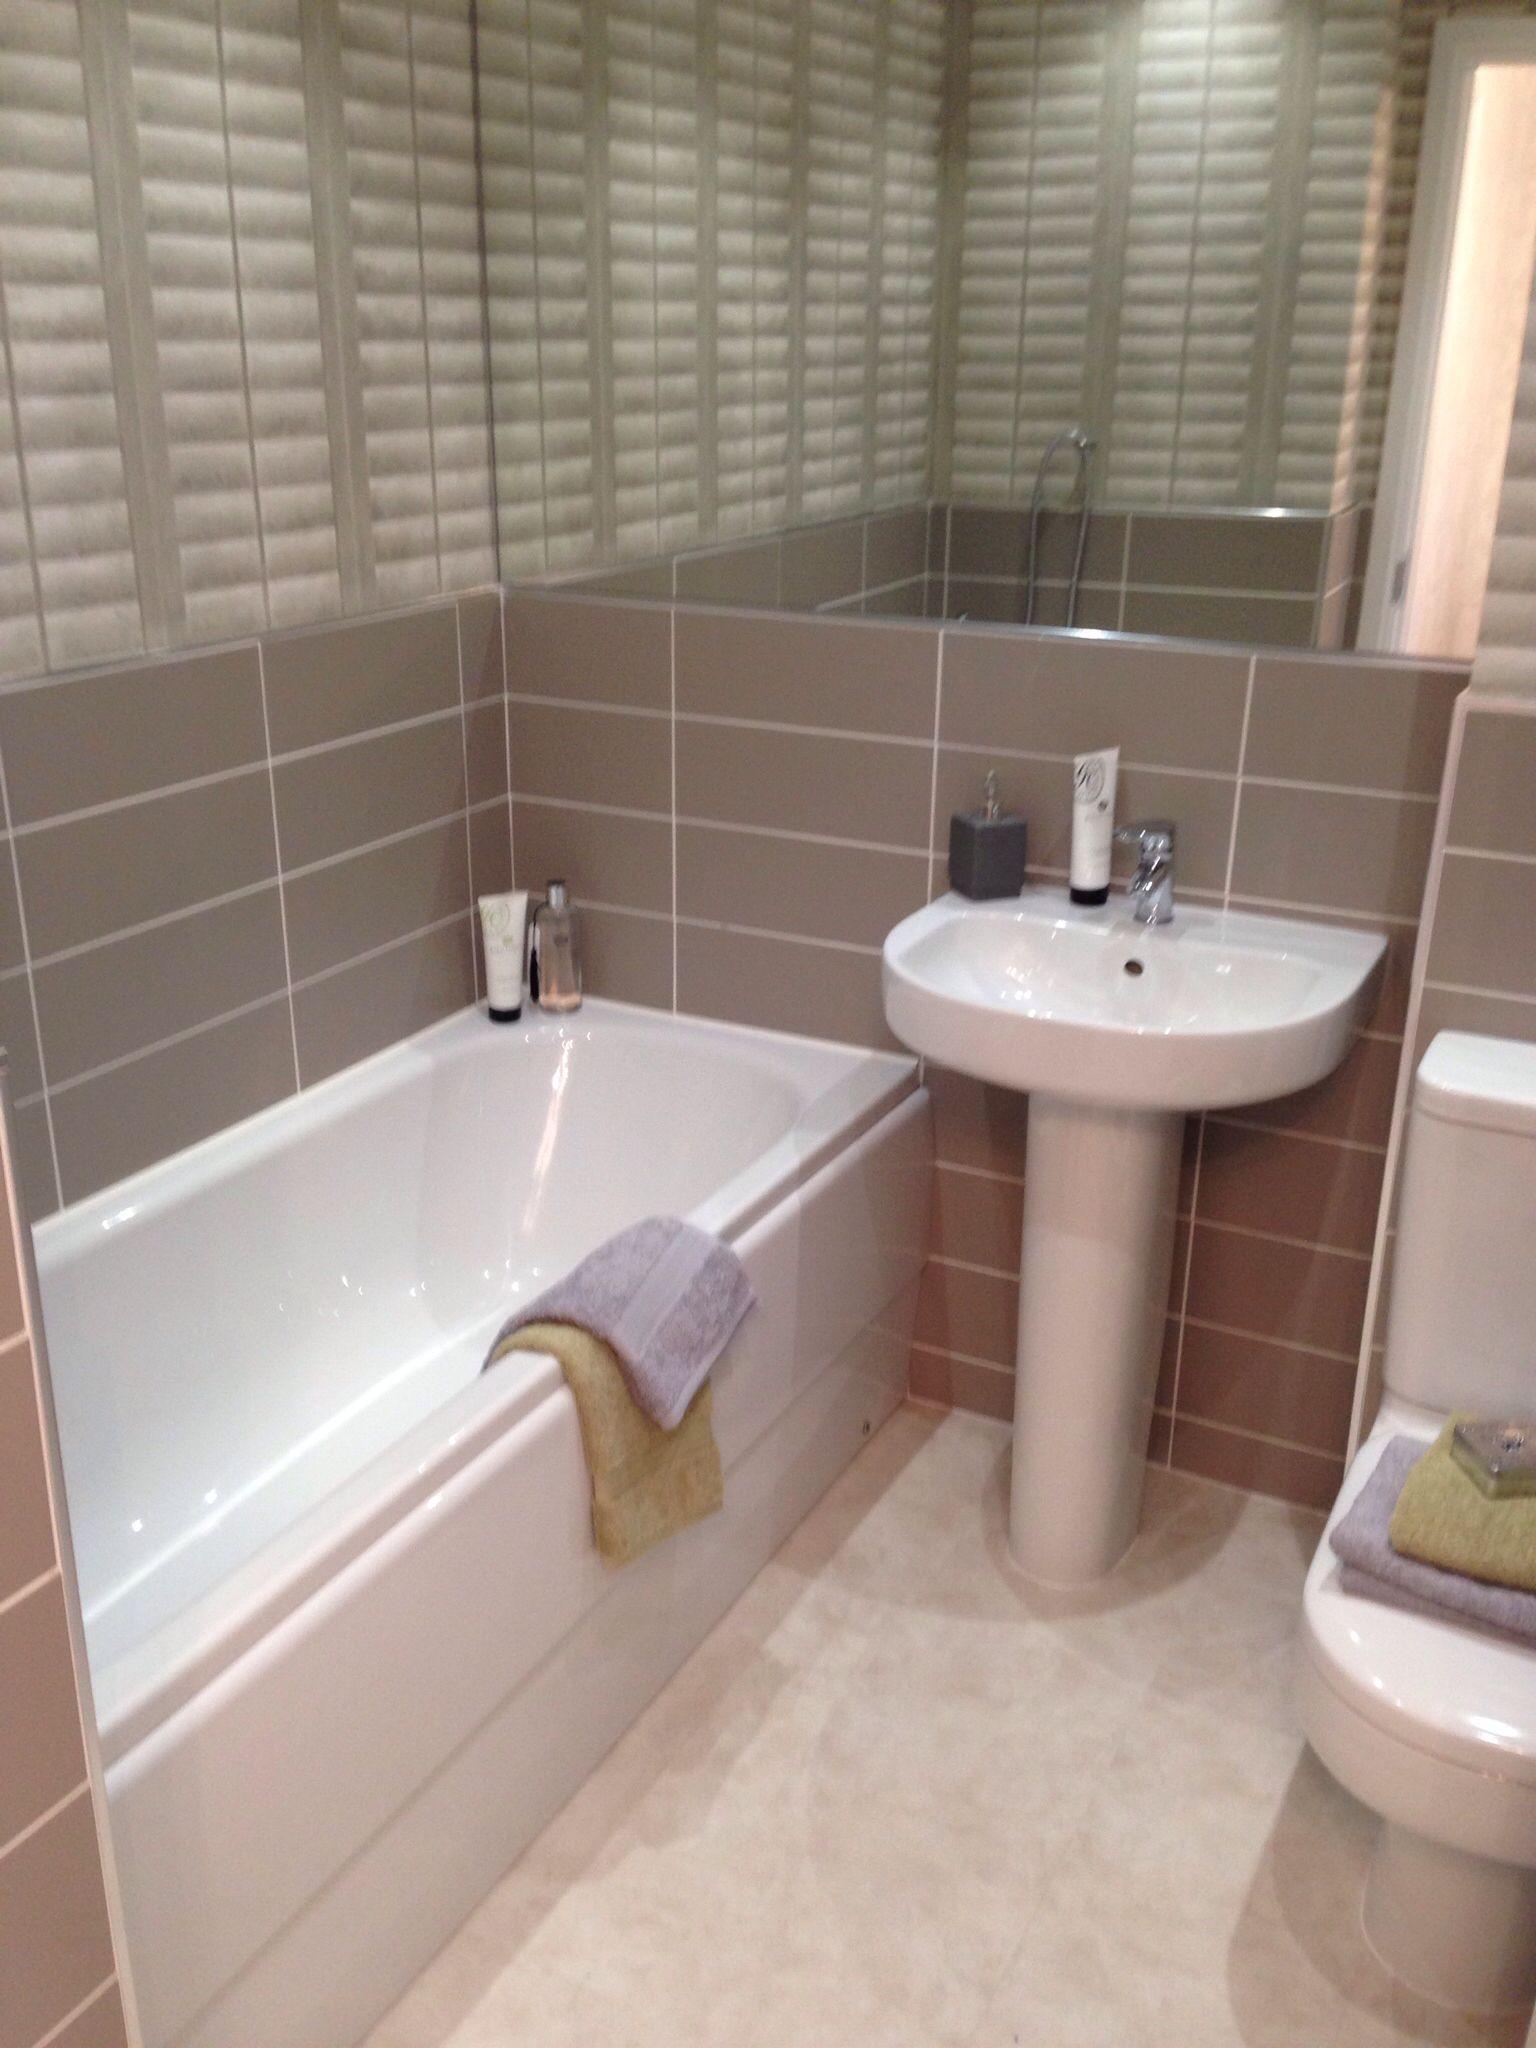 Pin By Emma Robertson On Bathroom Ideas Small Bathroom Remodel Small Apartment Bathroom Tile Bathroom